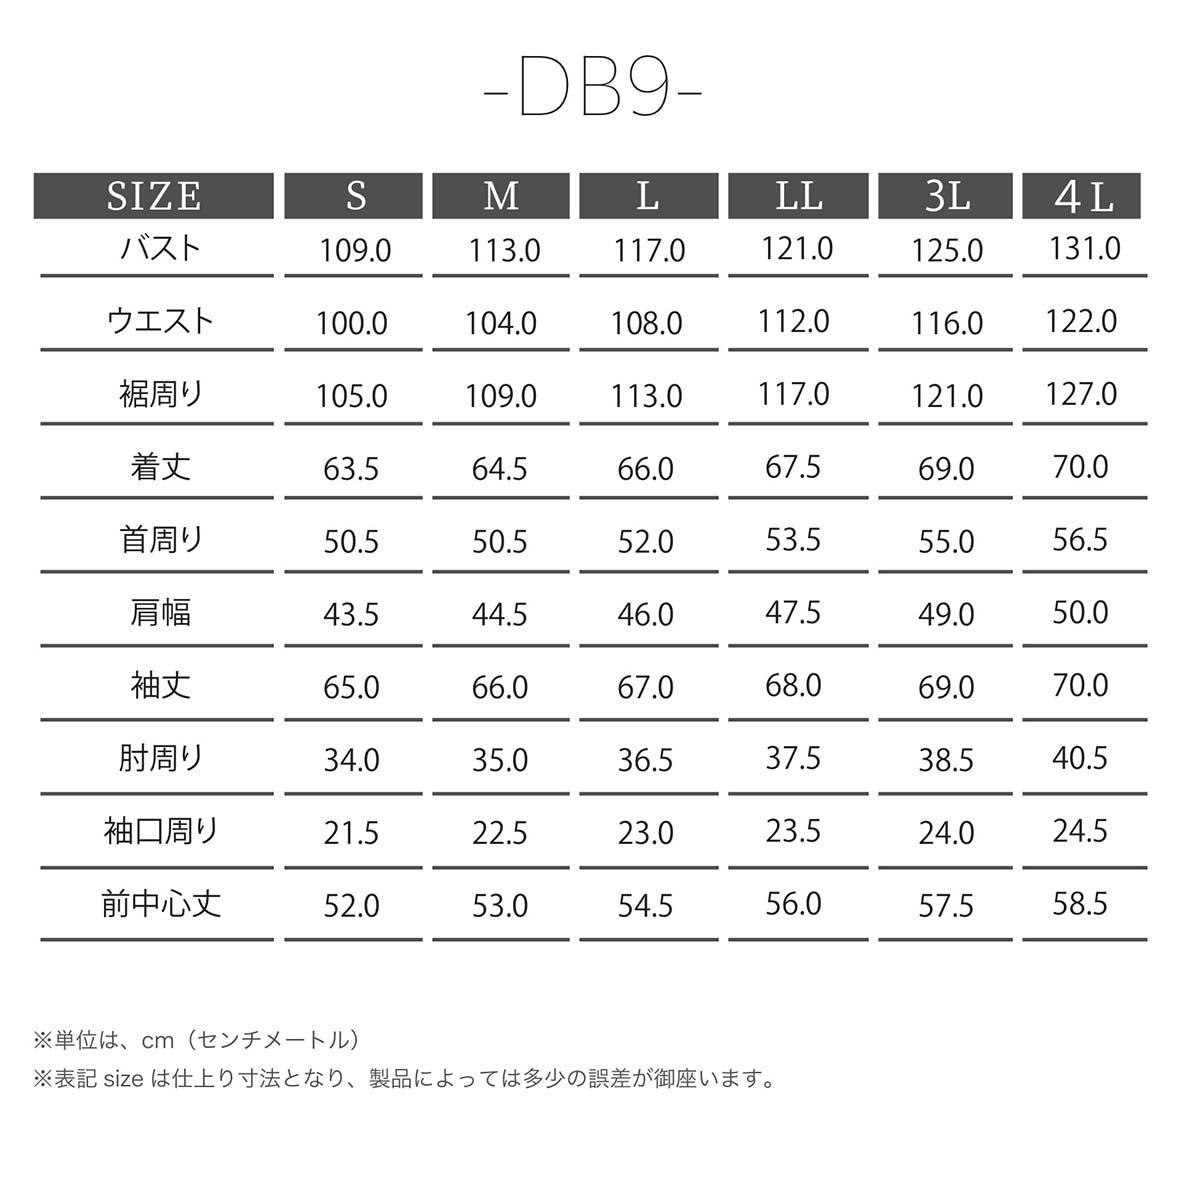 KADOYA(カドヤ) K'S LEATHER  DB9 ダイヤモンドキルティング レザージャケット ワイン